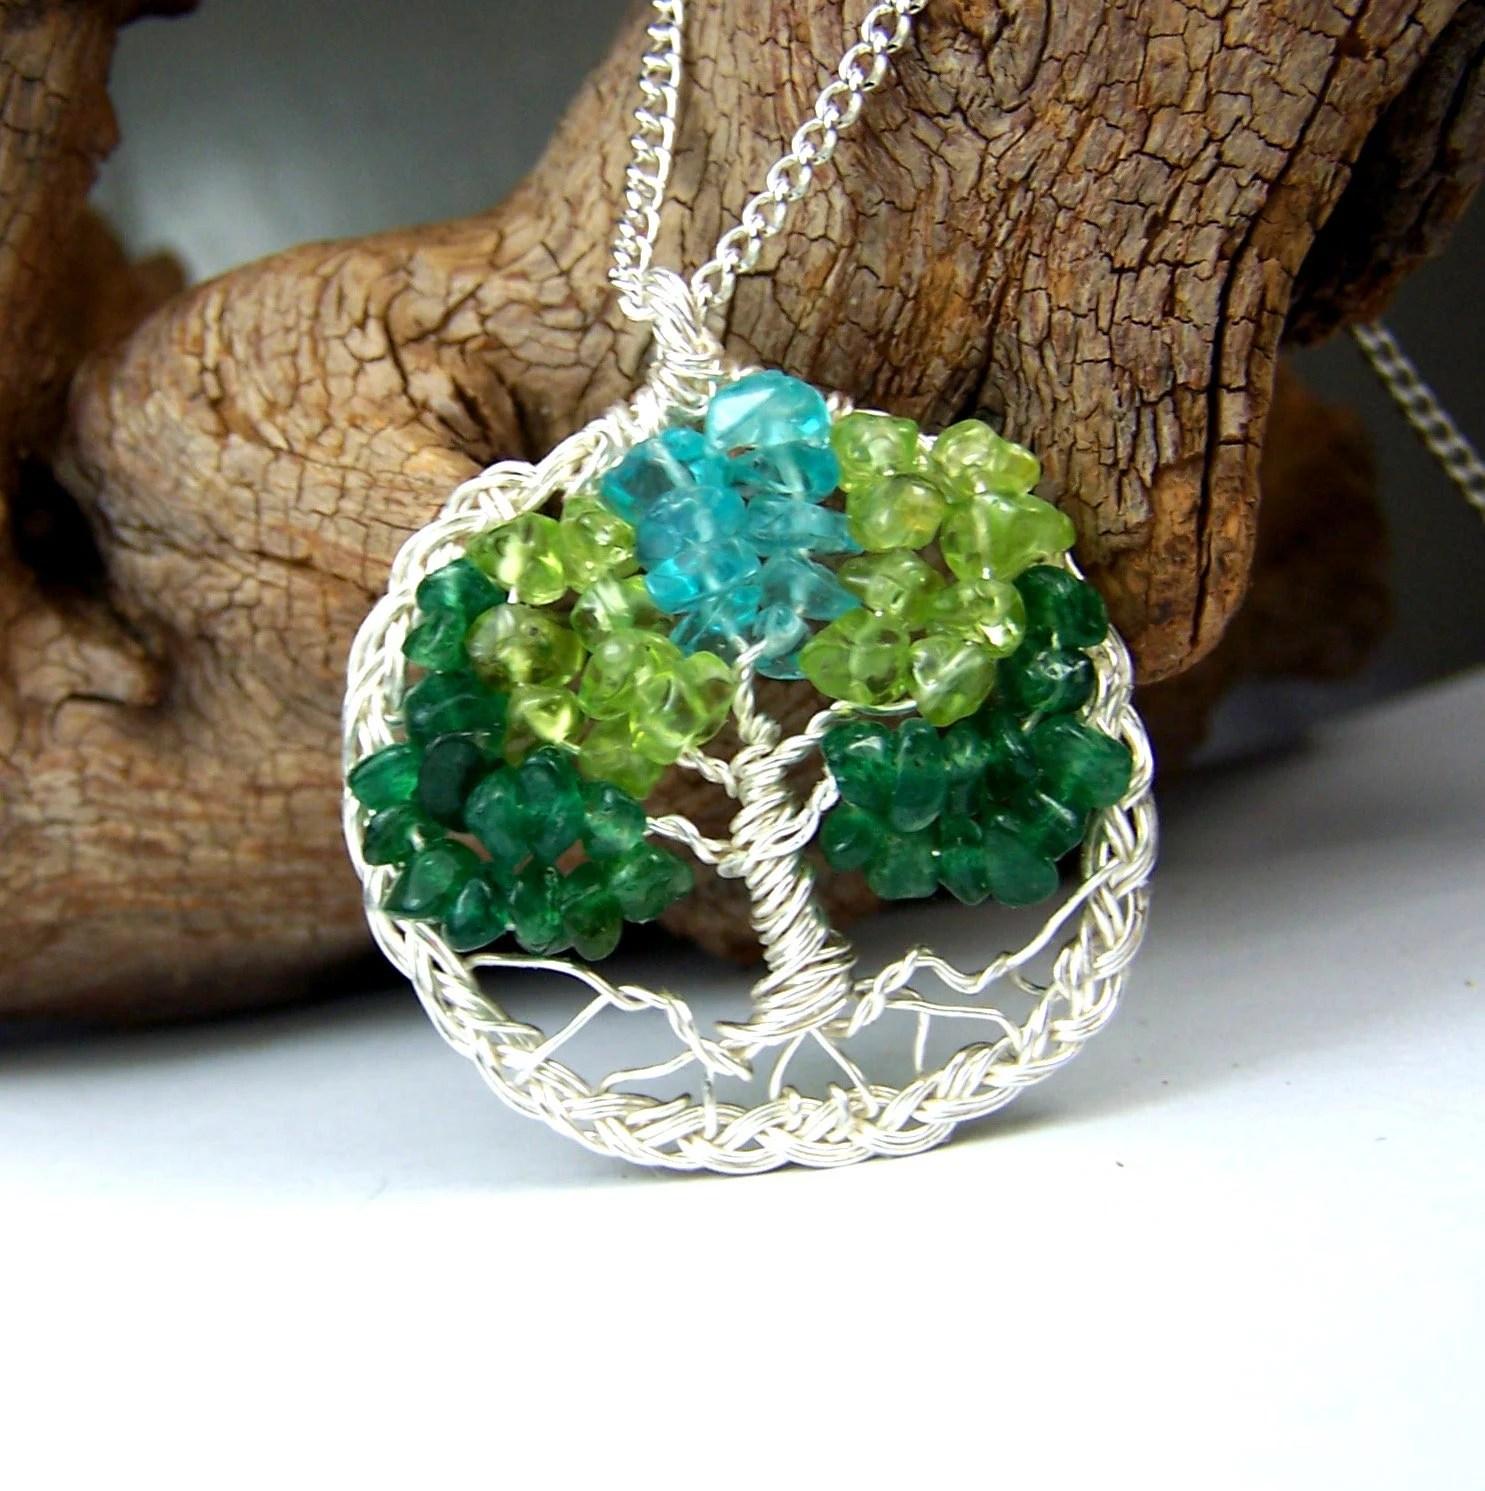 Celtic Knot Tree of Life necklace pendant in silver with chain - Emerald Green Aventurine - Peridot - Aquamarine blue - circle braided braid - mandalarain